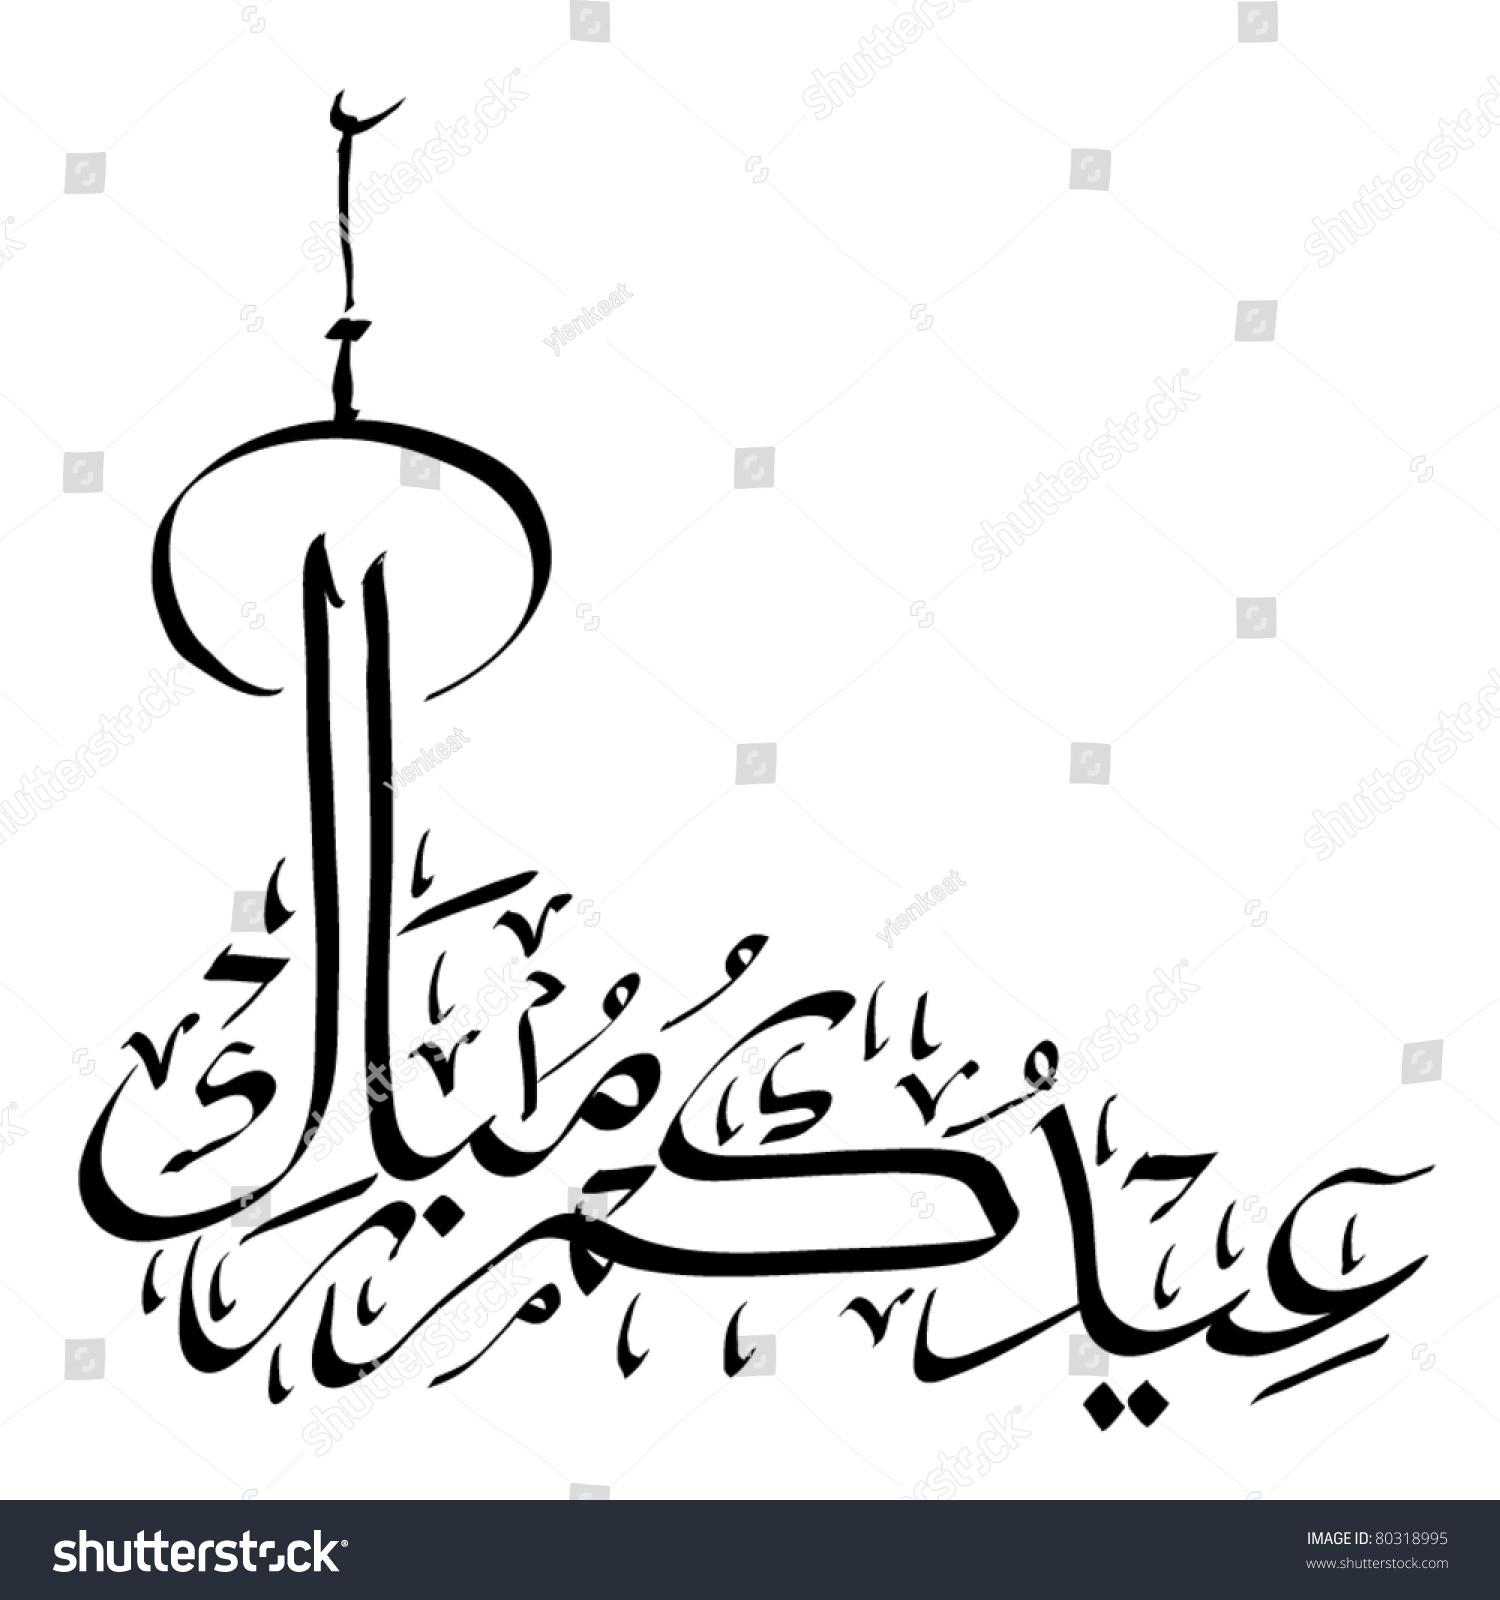 Vector arabic hand written greeting calligraphy stock vector vector arabic hand written greeting calligraphy eid mubarak in mosque form kristyandbryce Choice Image